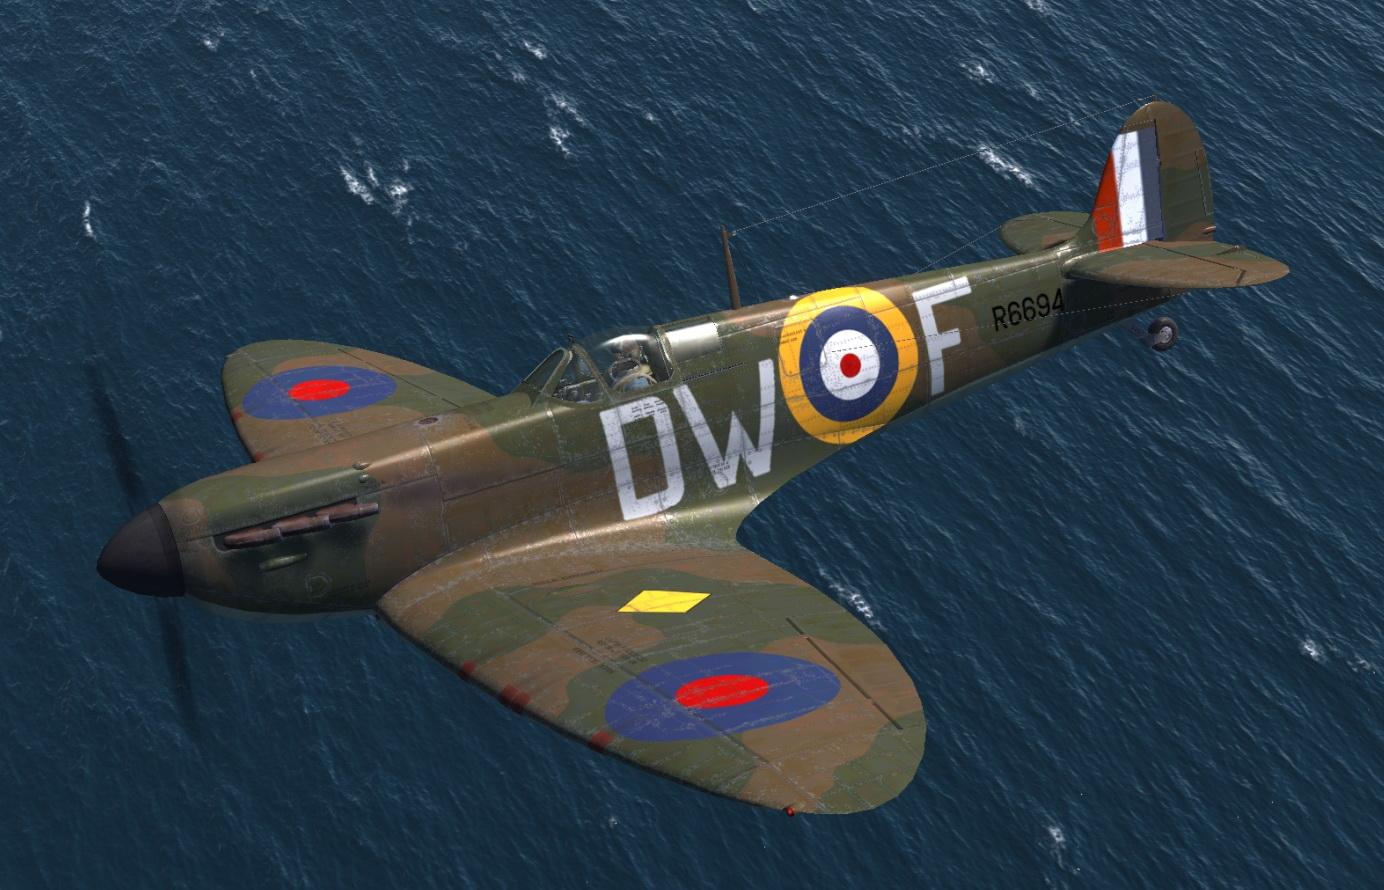 COD C6 MkI RAF 610Sqn DWF Pegge Chester England 1940 V0A